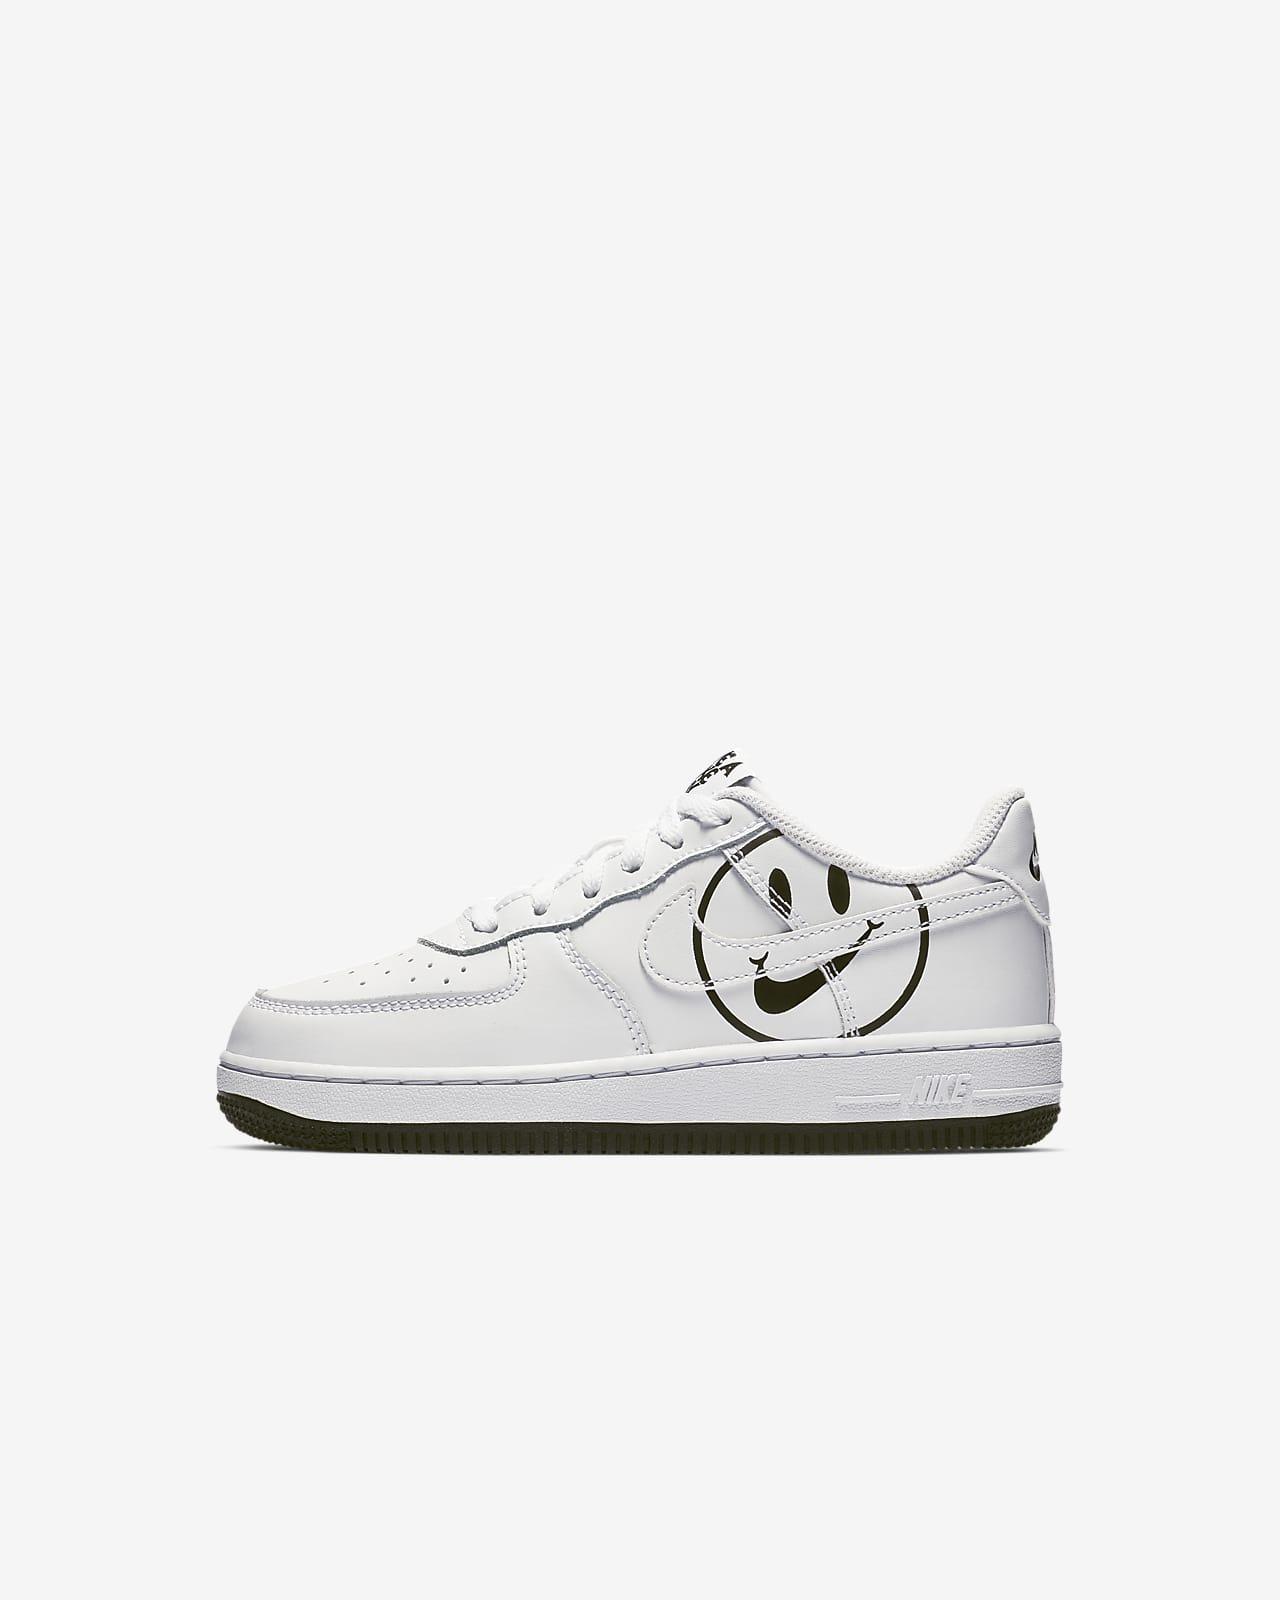 Nike Force 1 LV8 2 (PS)幼童运动童鞋